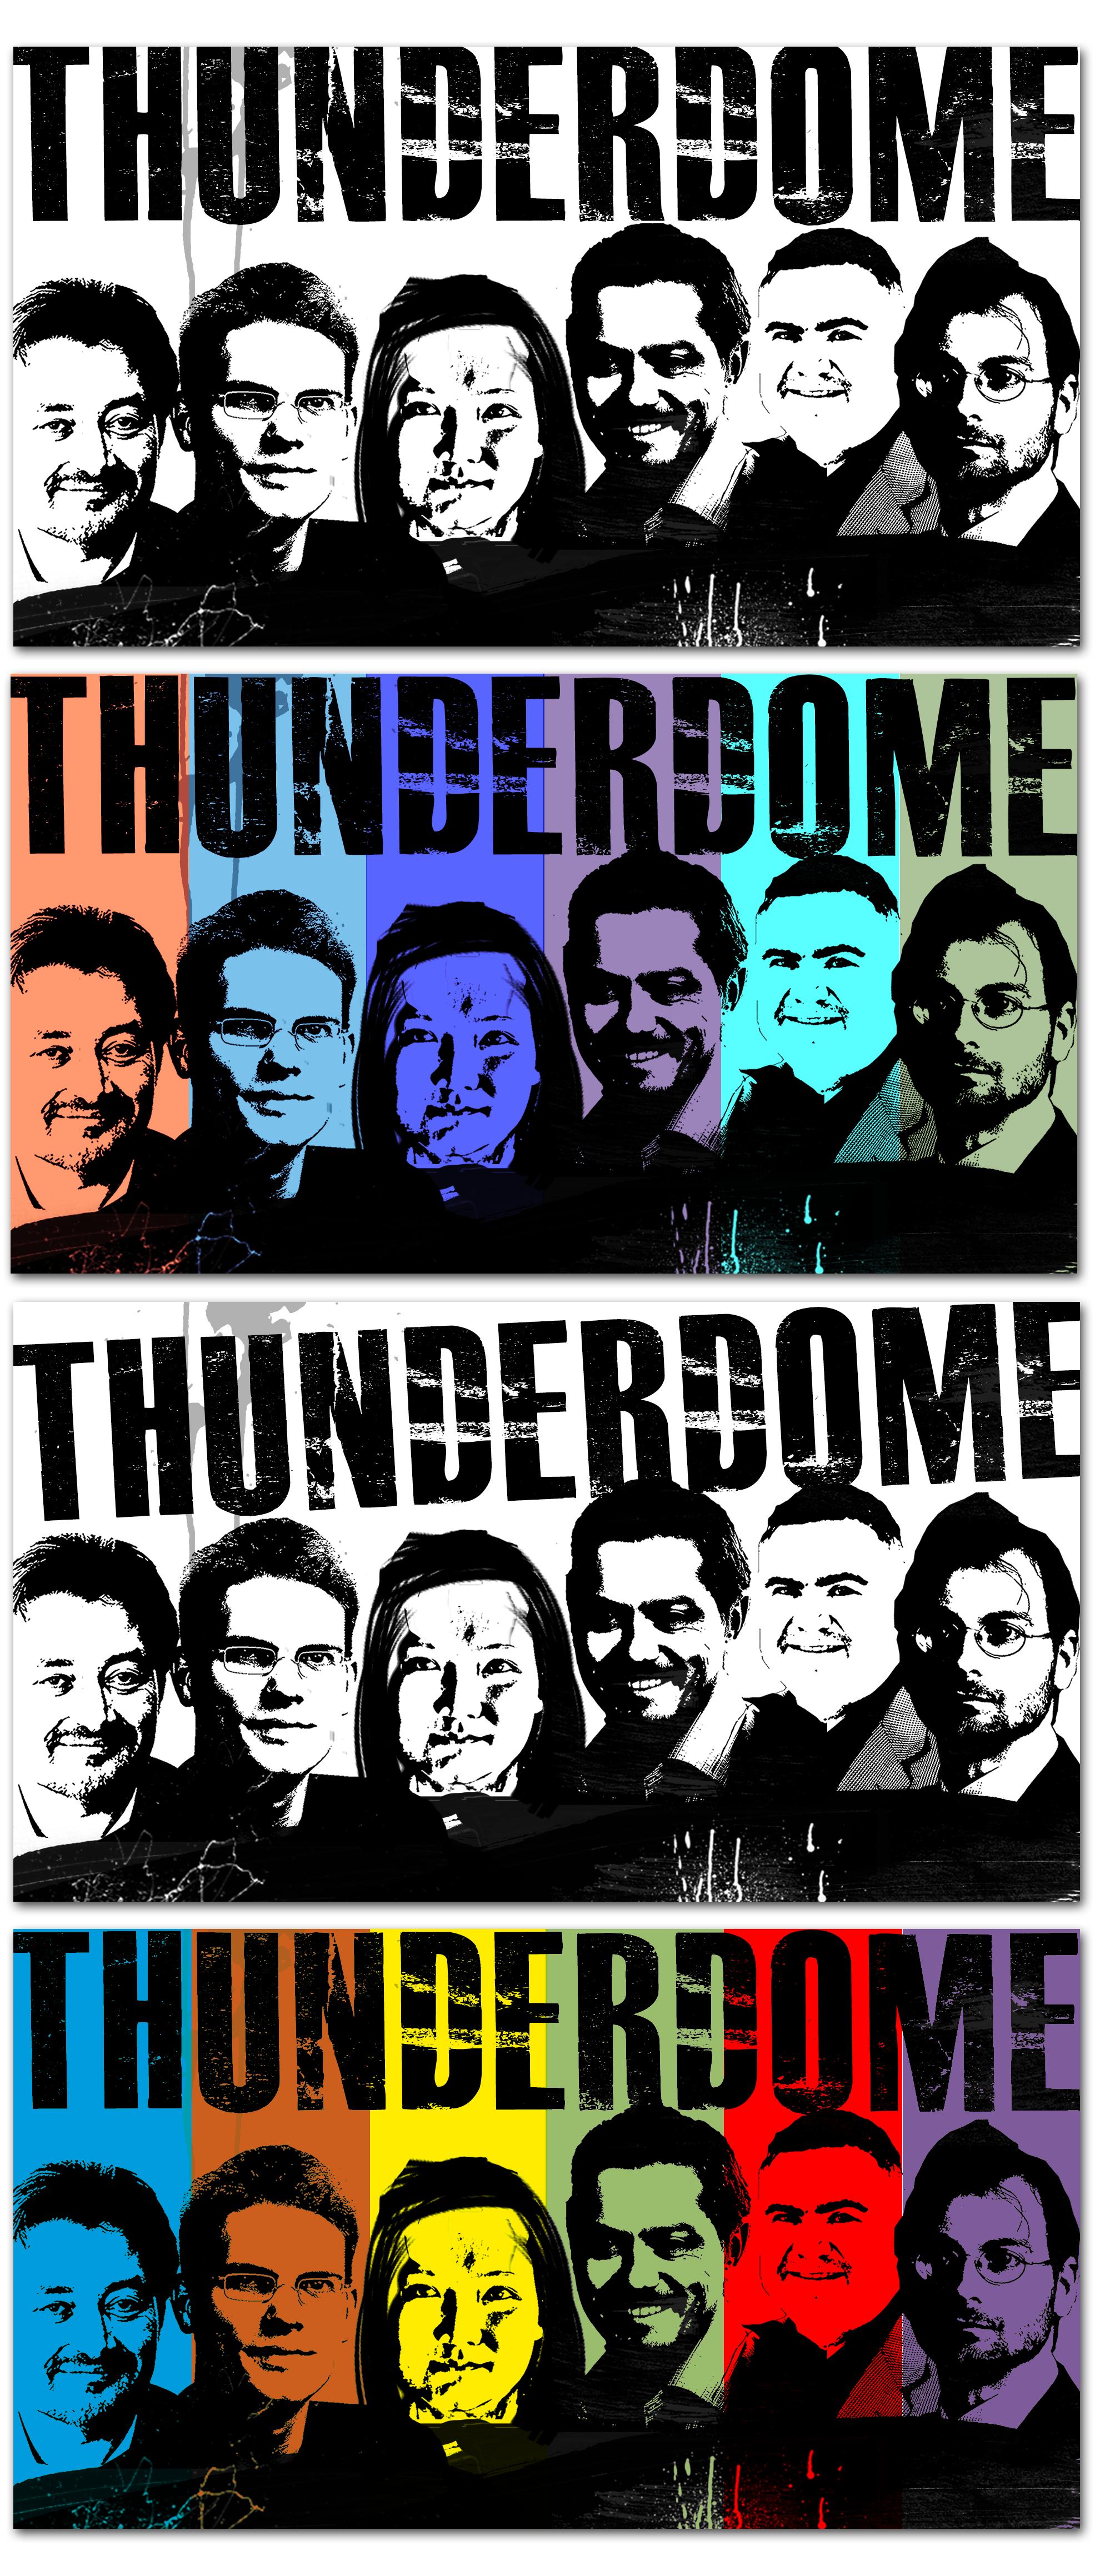 Thunderdome Art for Presentation